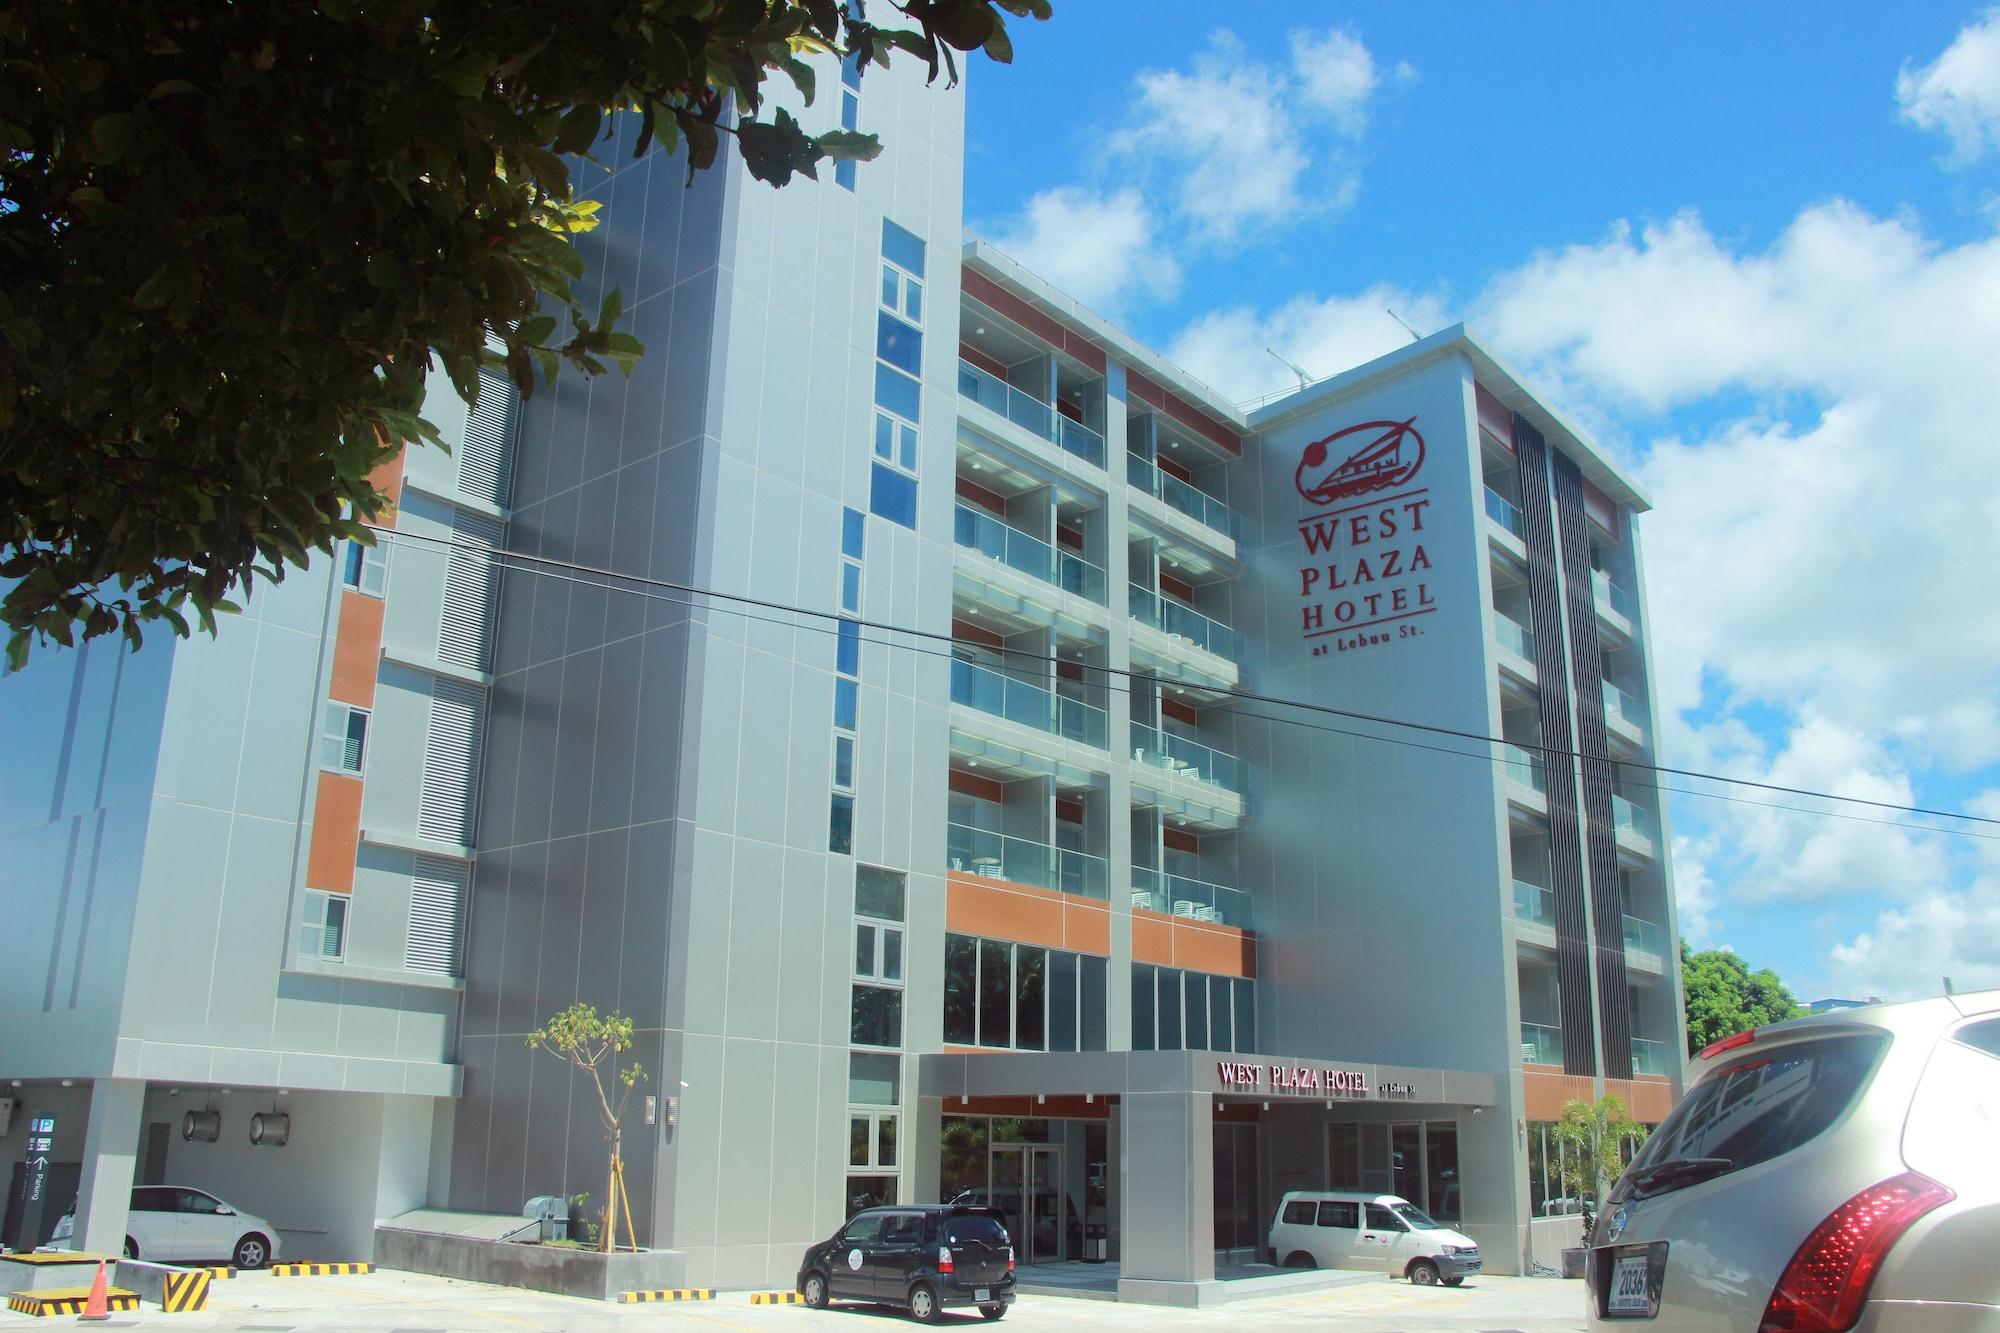 West Plaza Hotel at Lebuu Street,